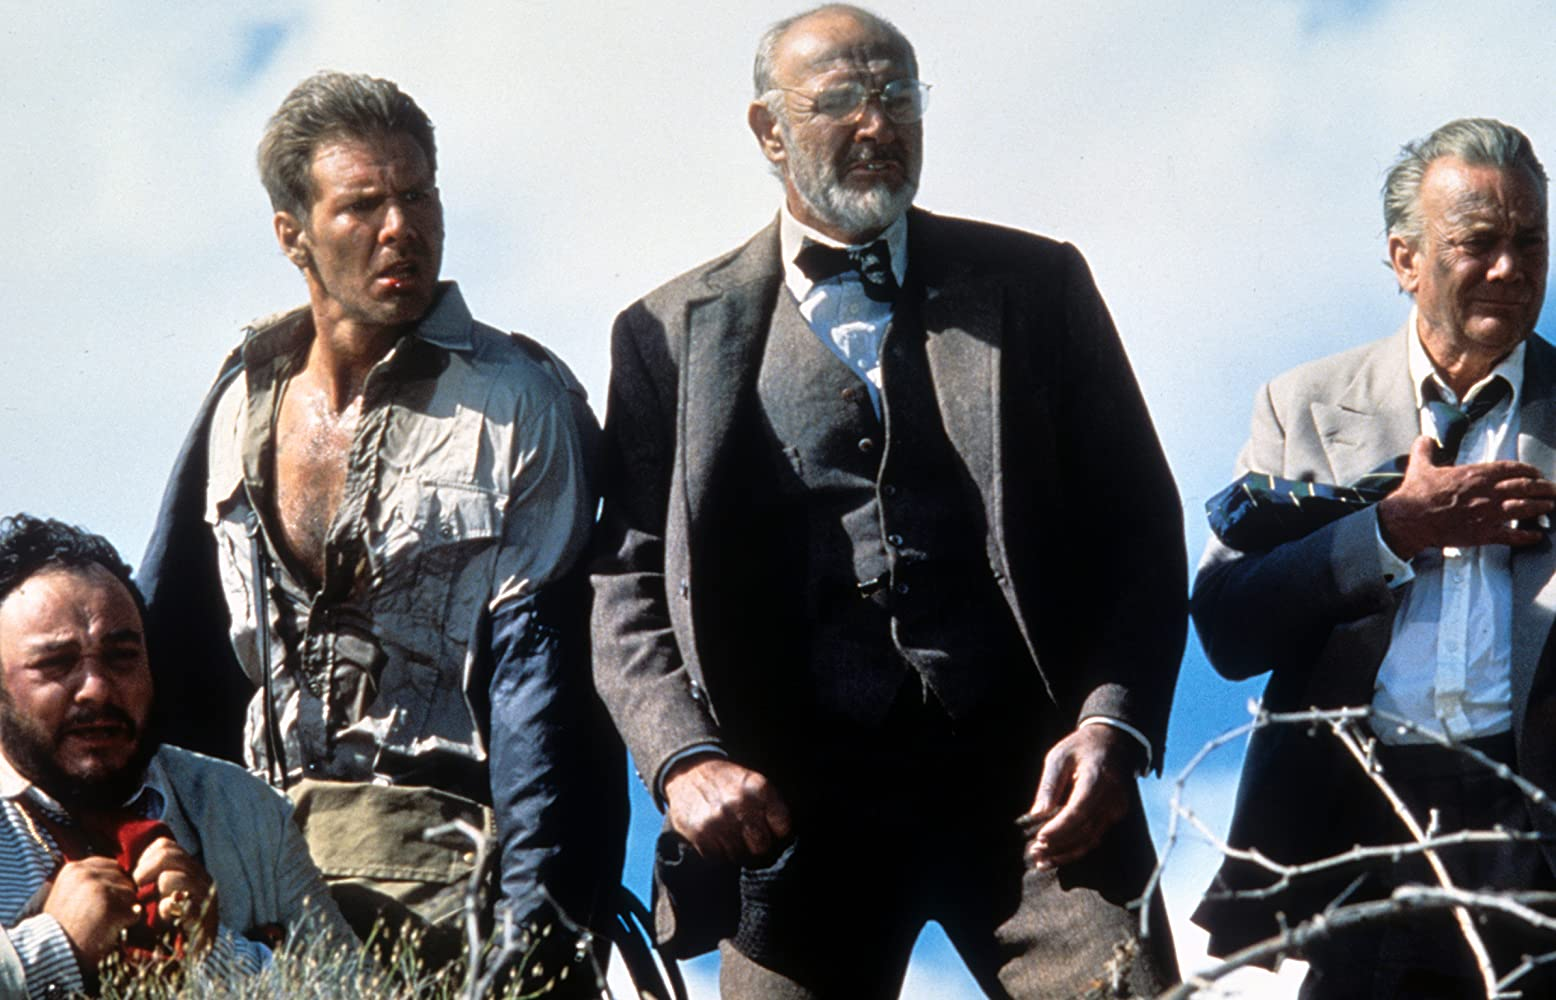 Sean Connery, Harrison Ford, Denholm Elliott, and John Rhys-Davies in Indiana Jones and the Last Crusade (1989)